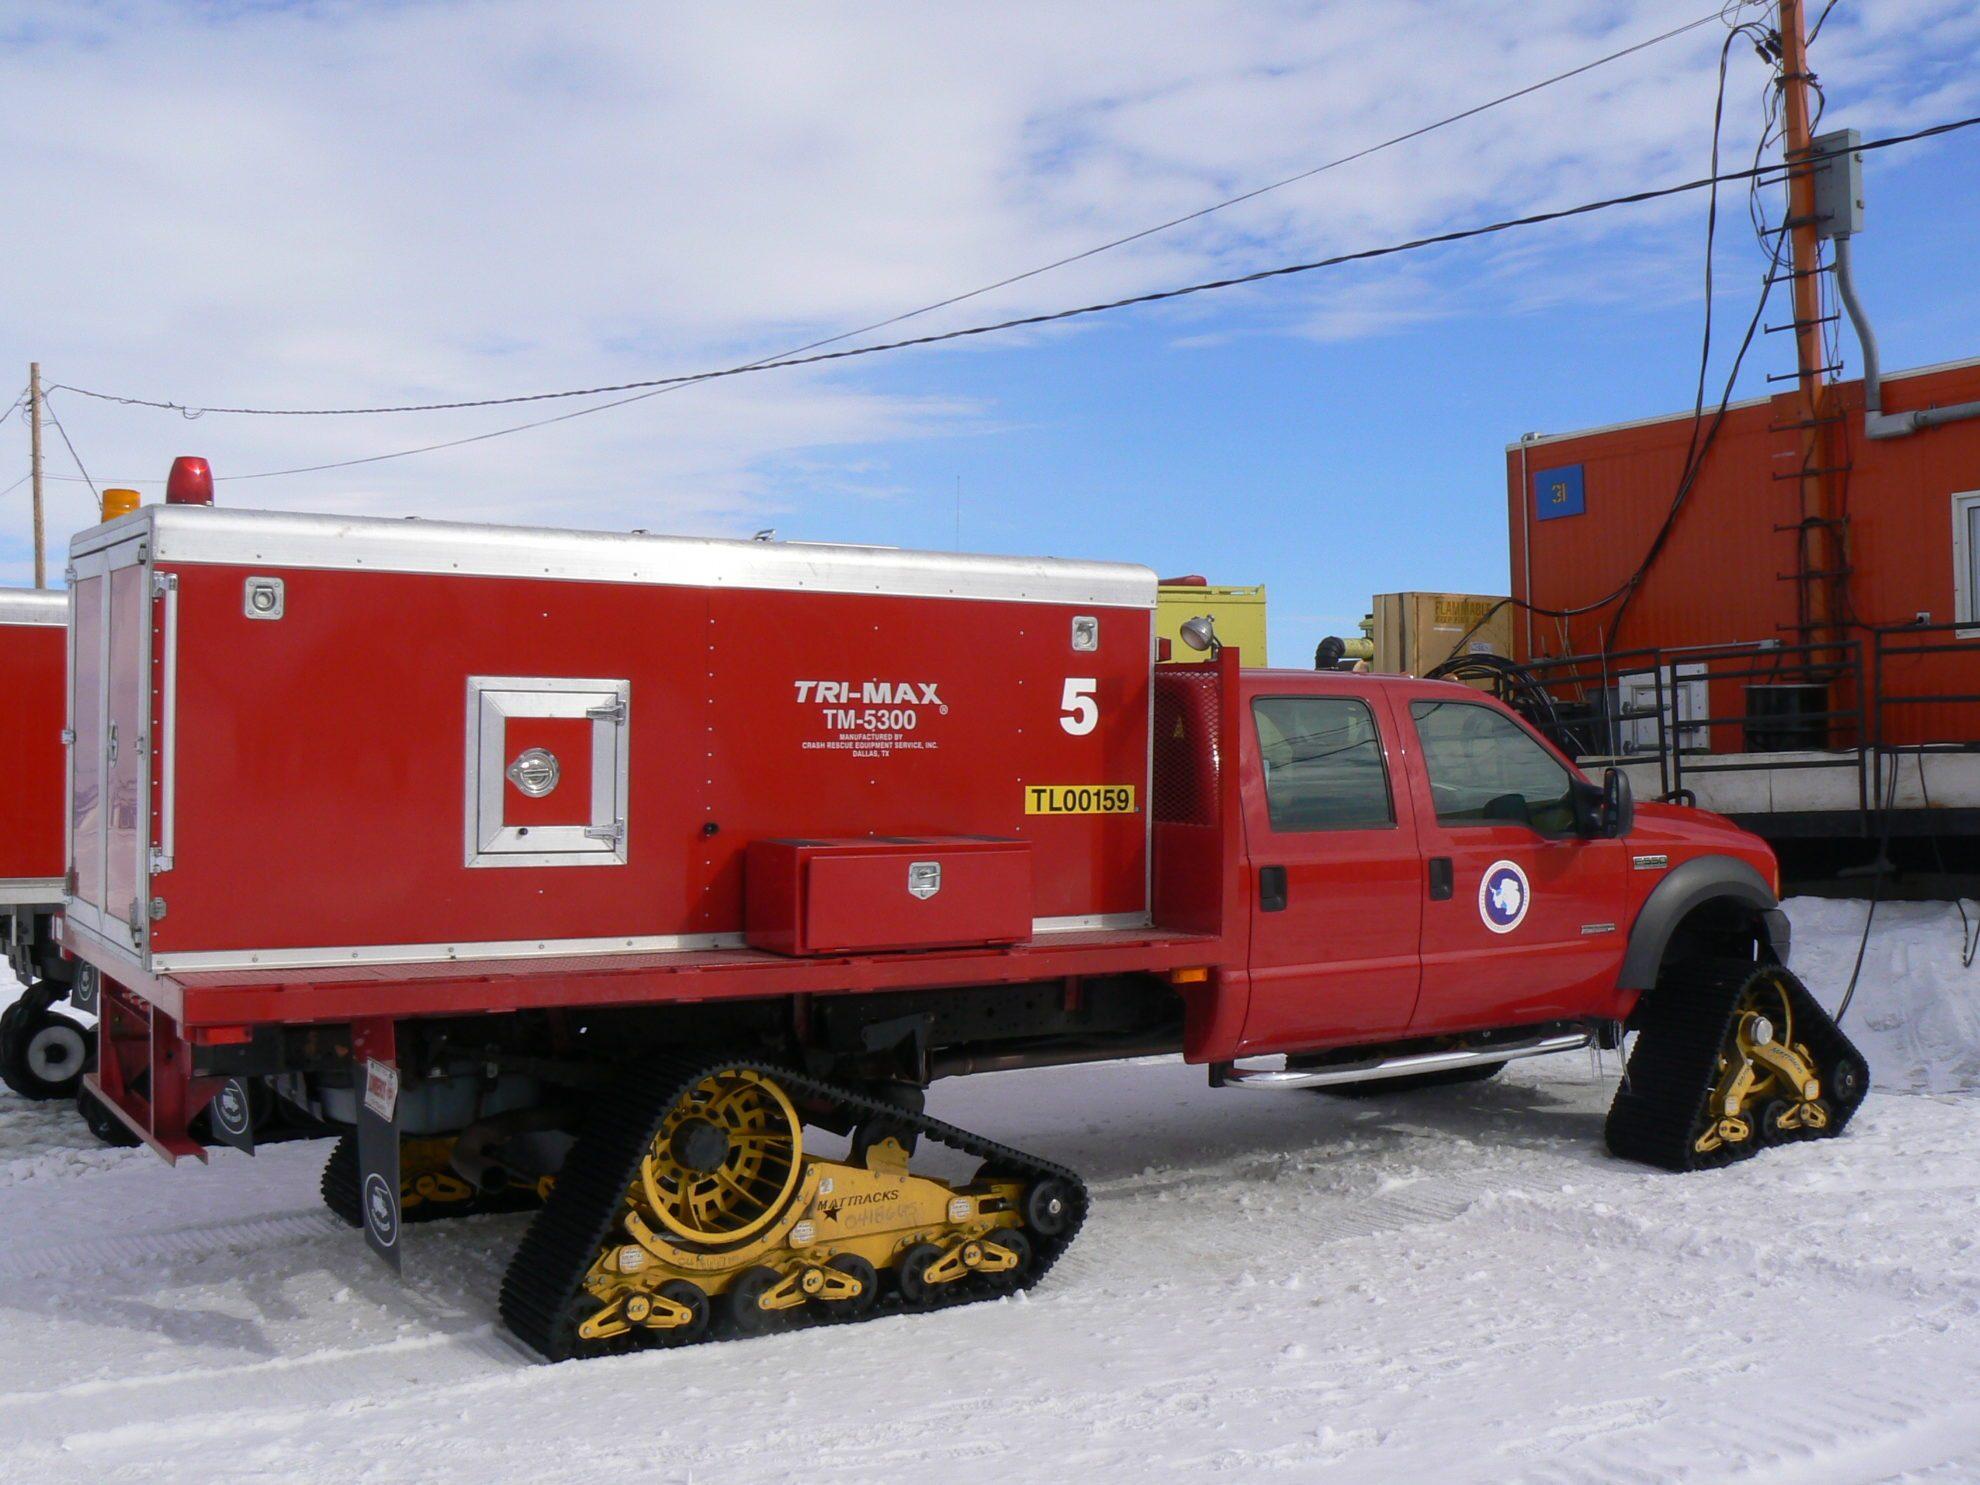 Пожарная машина на базе автомобиля Ford F 550. Антарктида